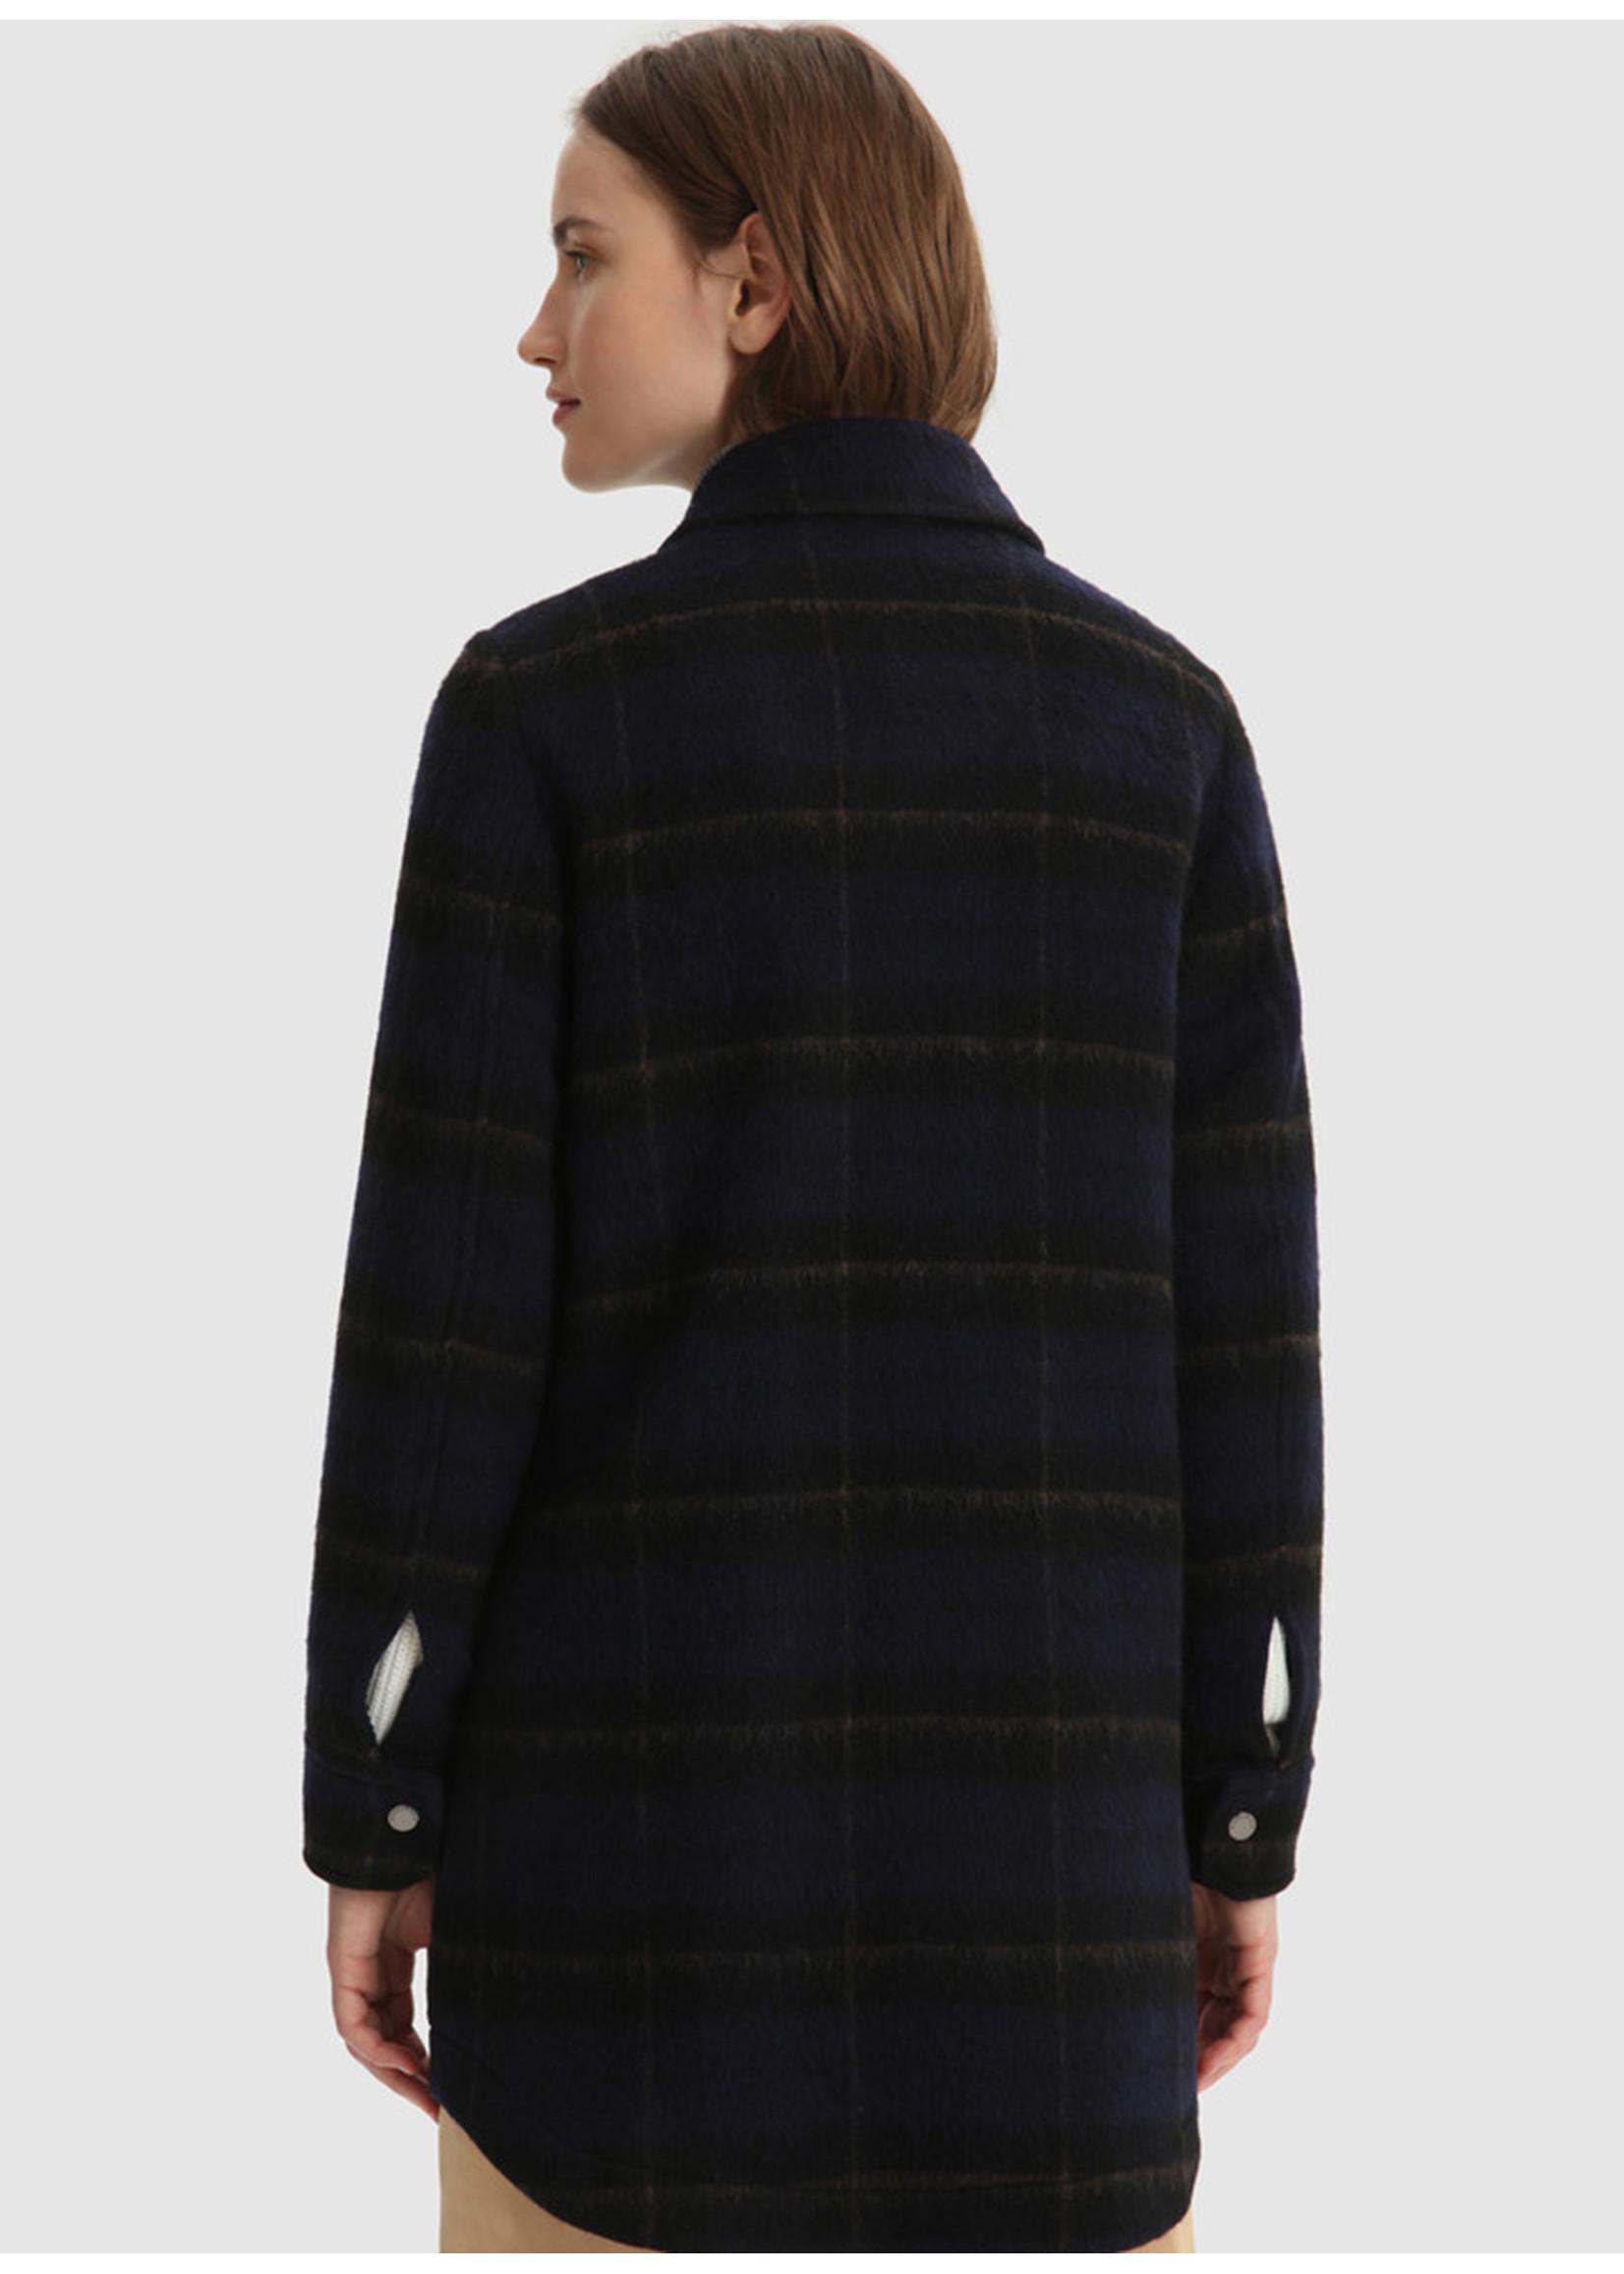 Woolrich Cozy Wool Medium Overshirt Blue Check